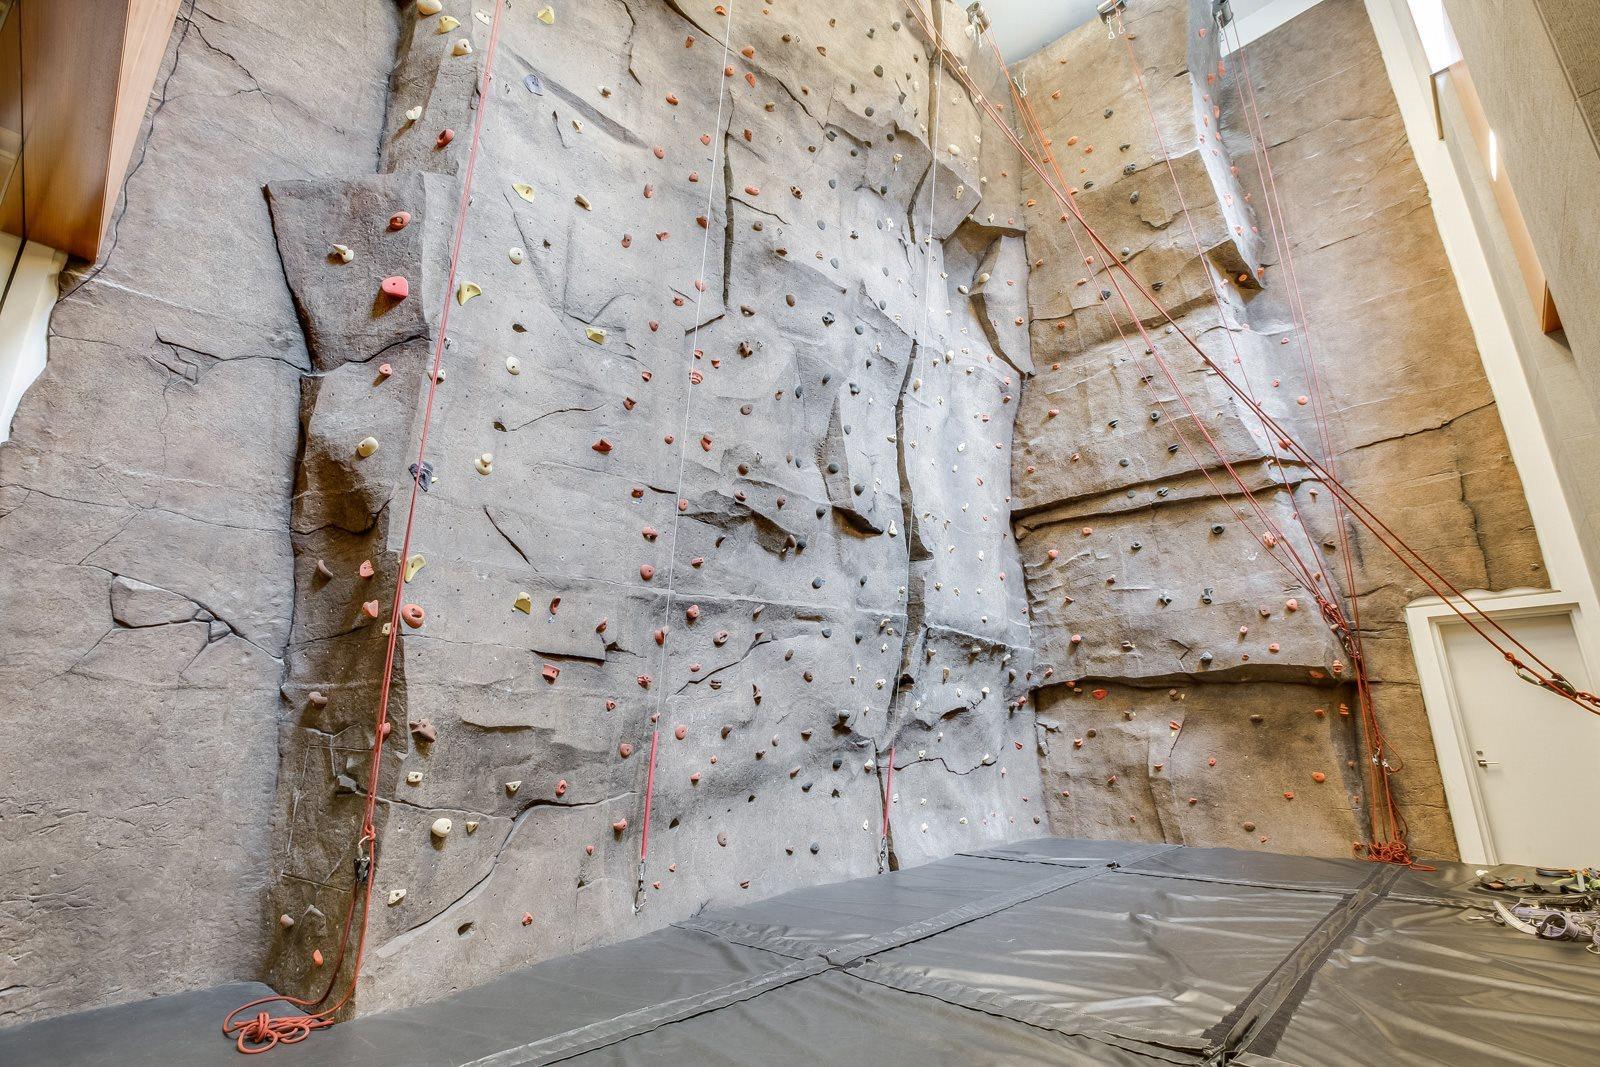 38' rock climbing wall at The Ashley Apartments, 400 W. 63rd Street, 10069